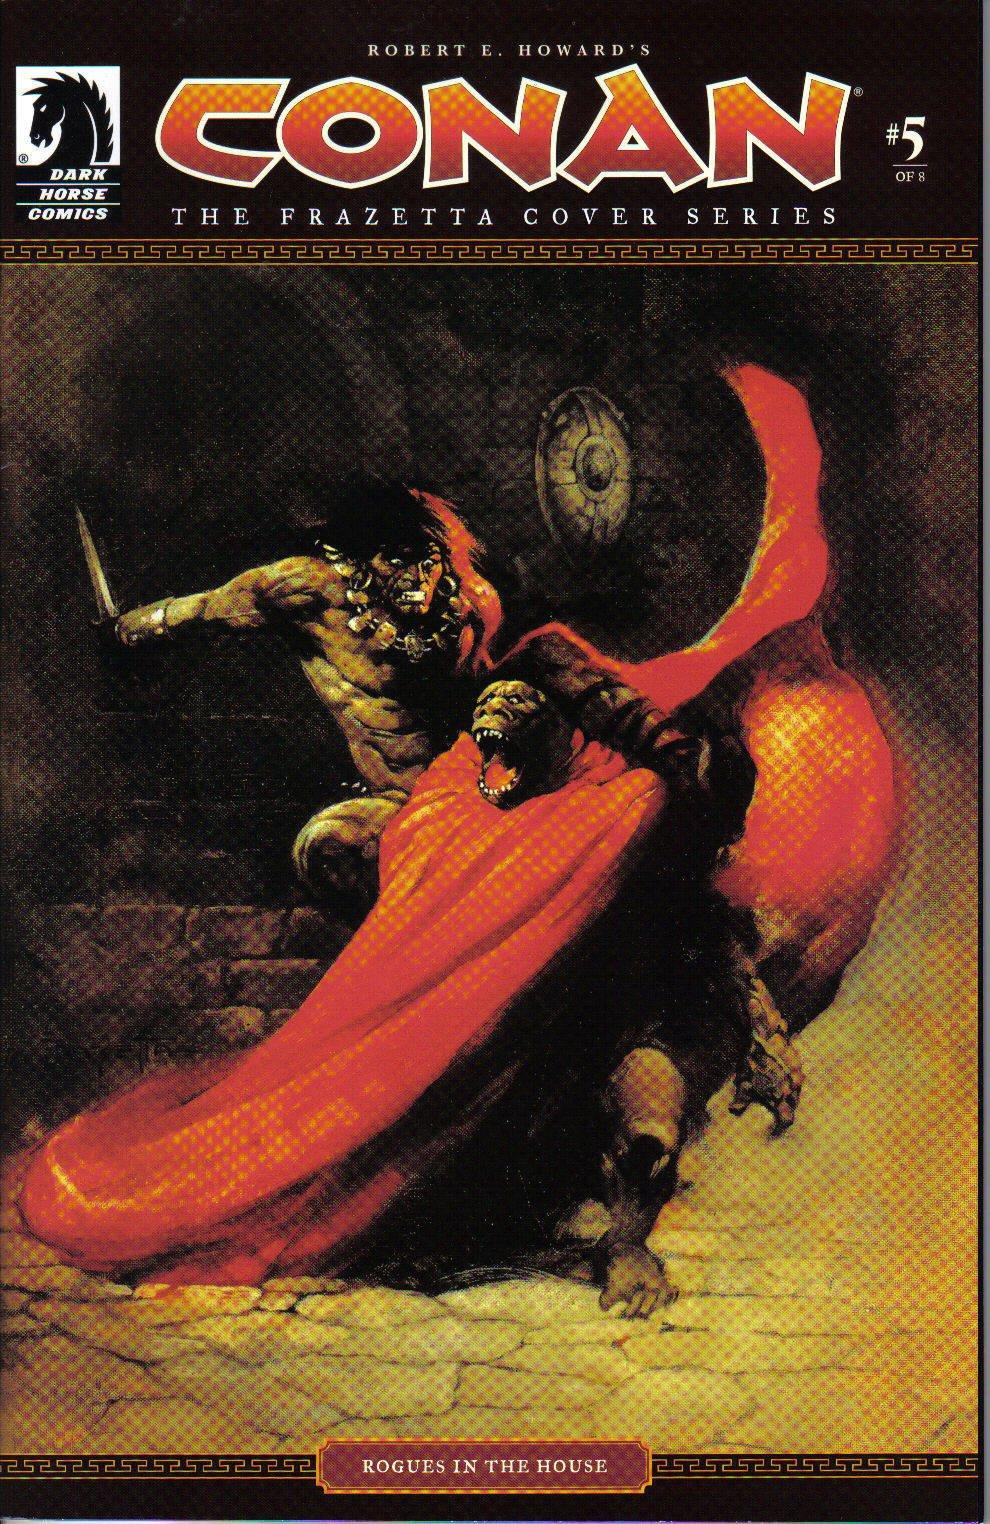 Robert E Howard's Conan No. 5 of 8 The Frazetta Cover Series PDF